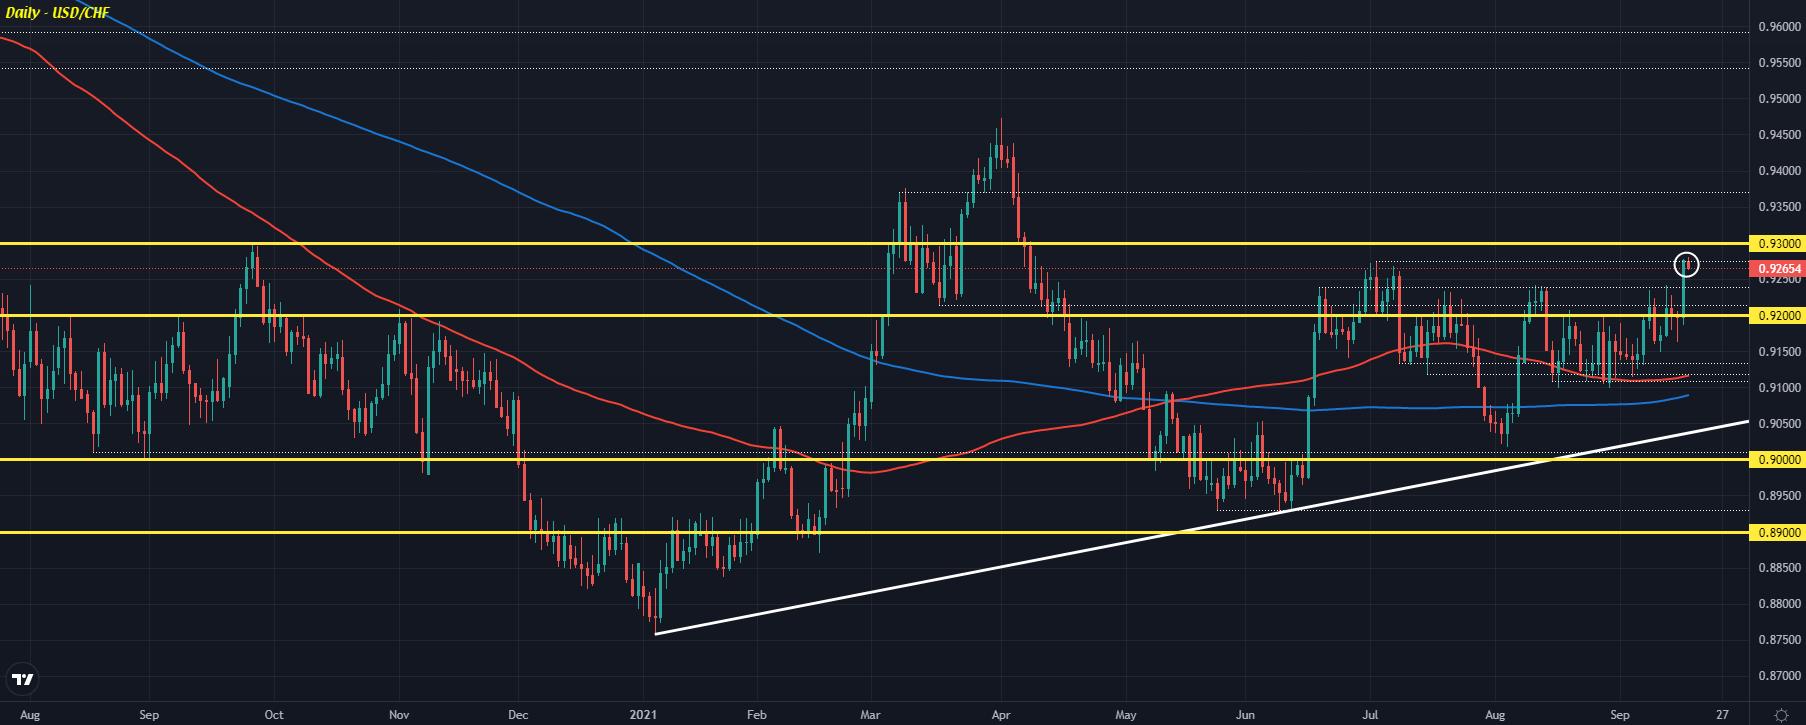 Dollar, yen slightly softer so far on the session